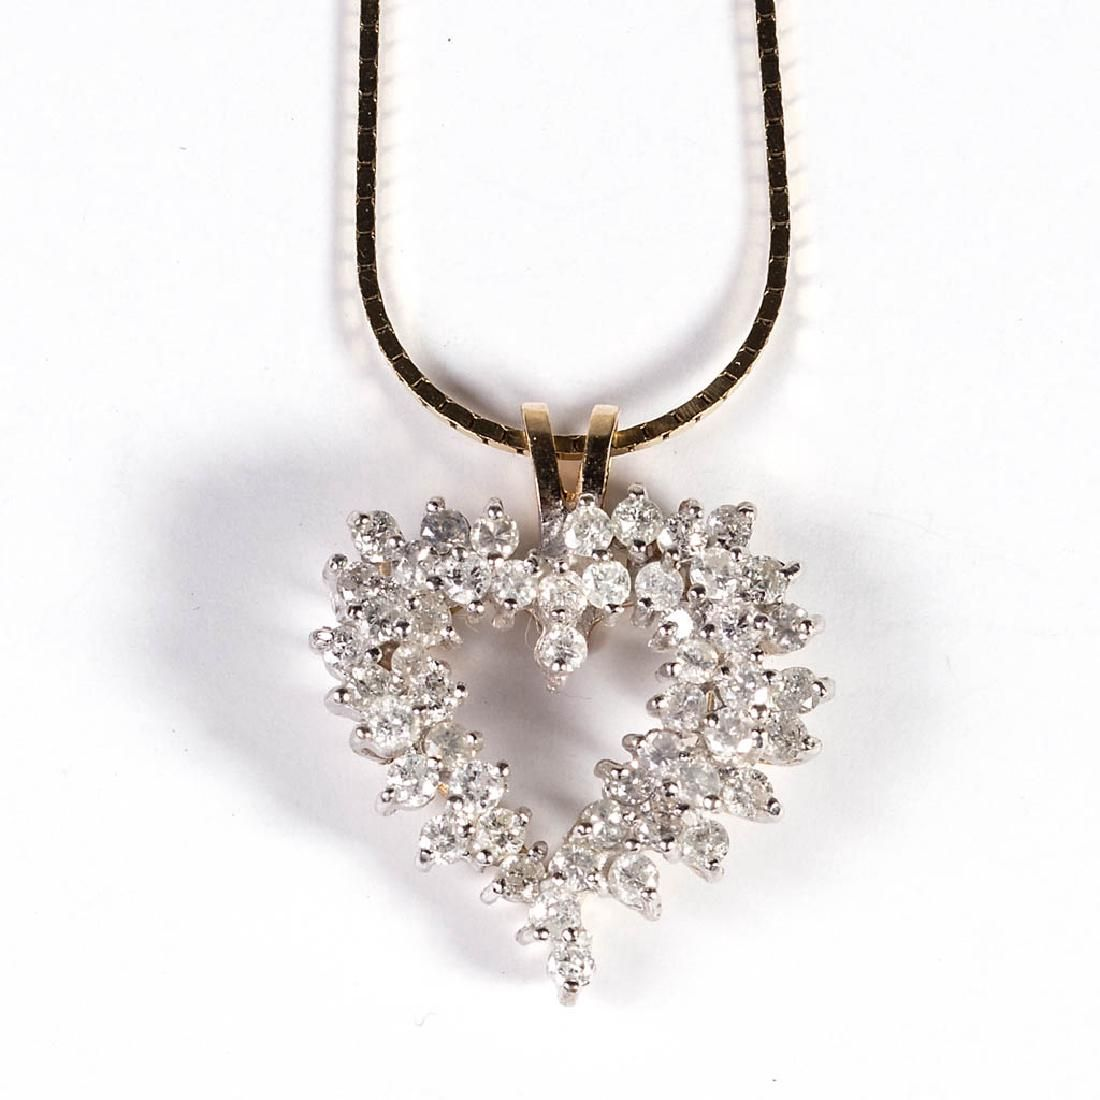 VINTAGE LADY'S 14K GOLD AND DIAMOND FIGURAL PENDANT